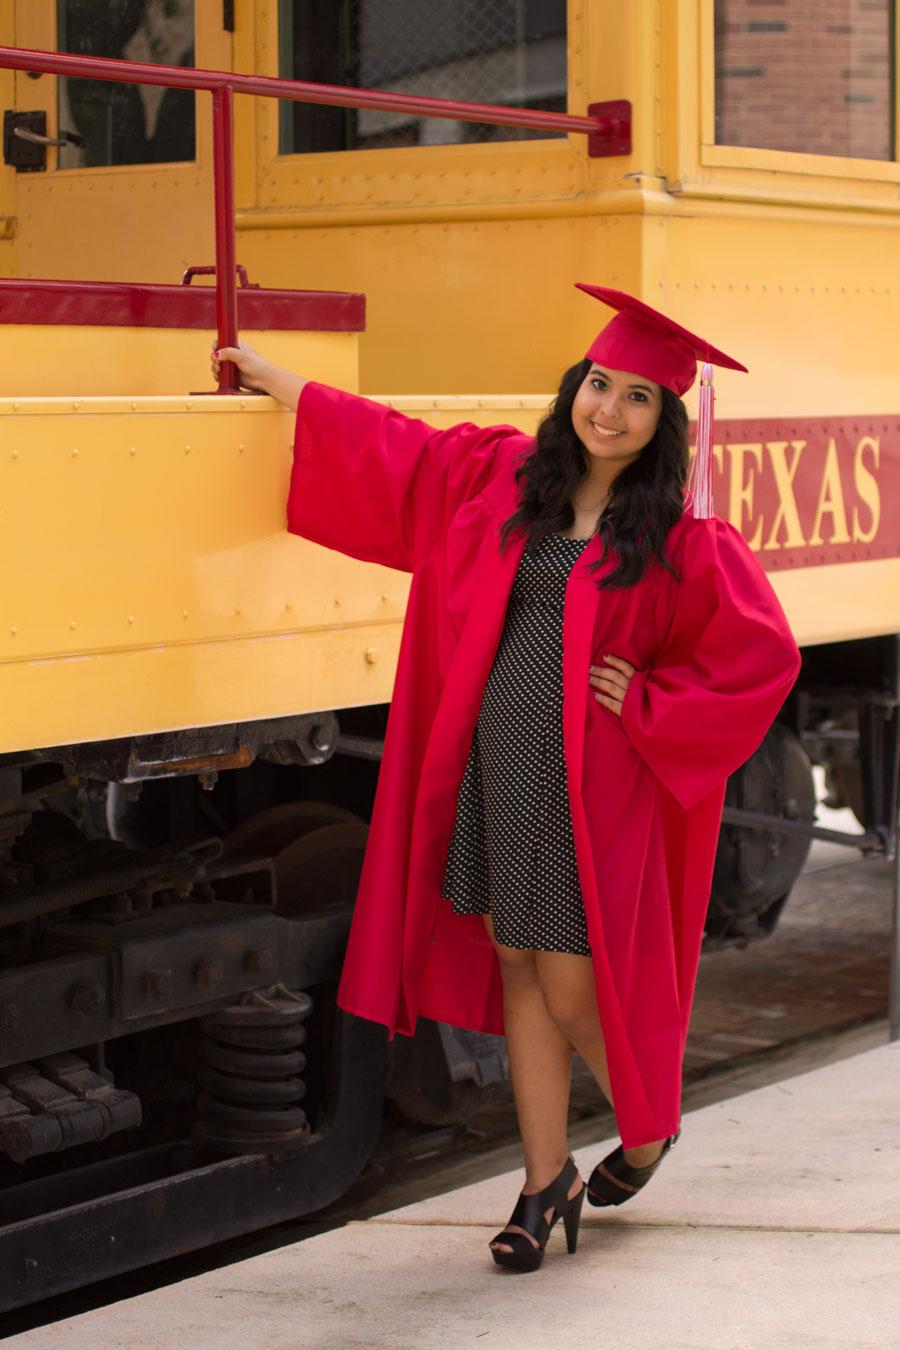 Senior Graduates Photographer San Antonio Texas Kat Venice Photography